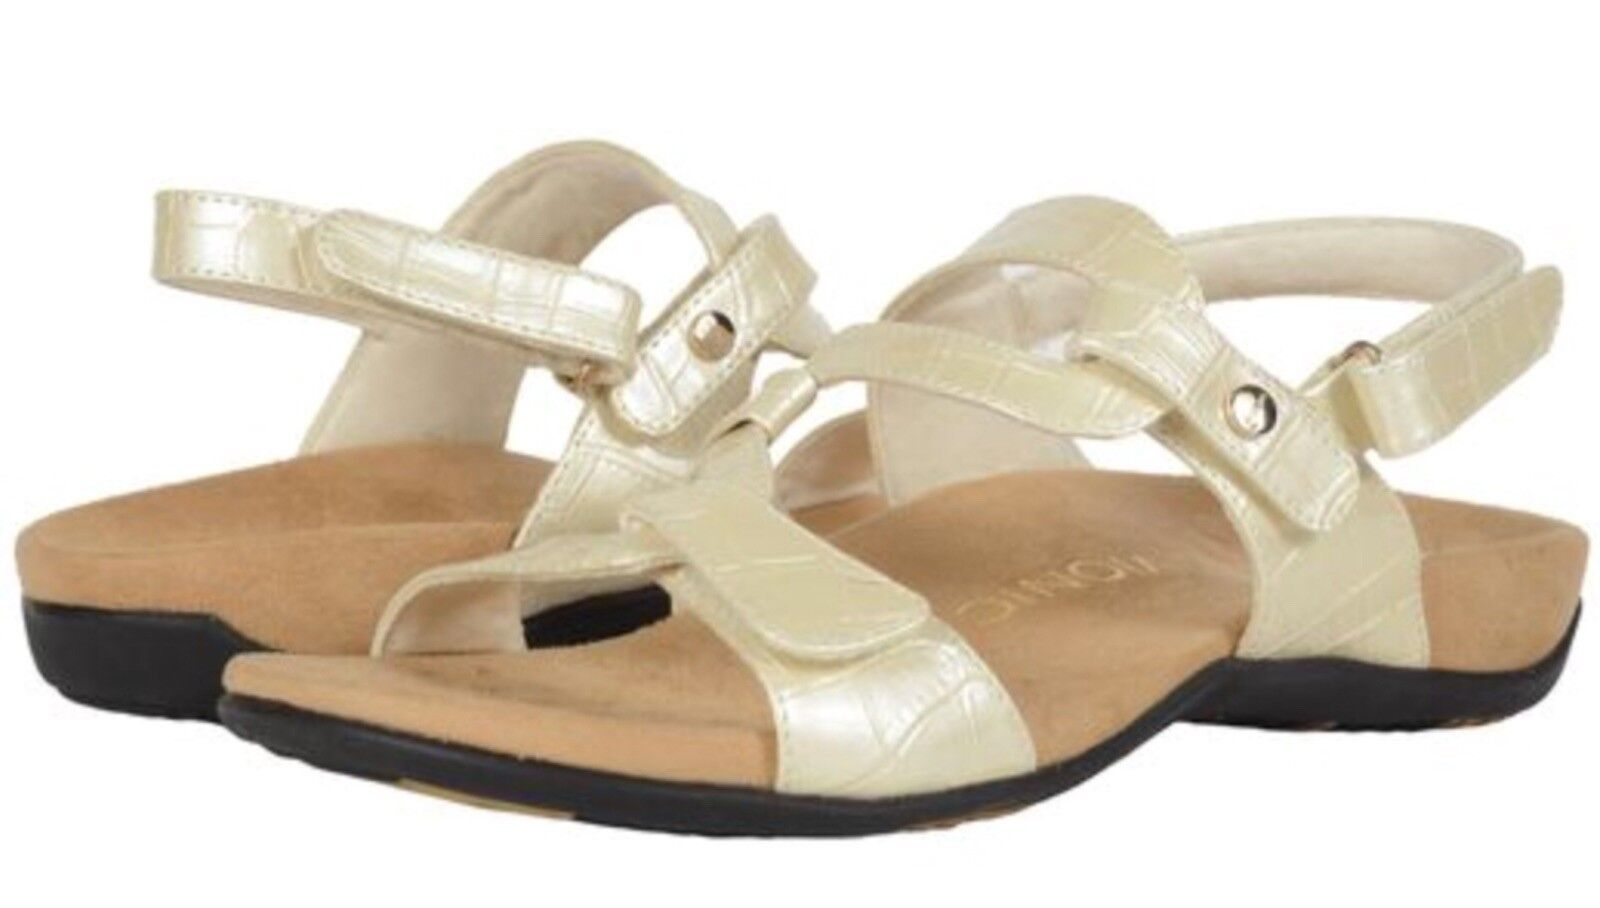 NIB Vionic Rest Paros Women's Adjustable Sandal Orthaheel Arch Support White I